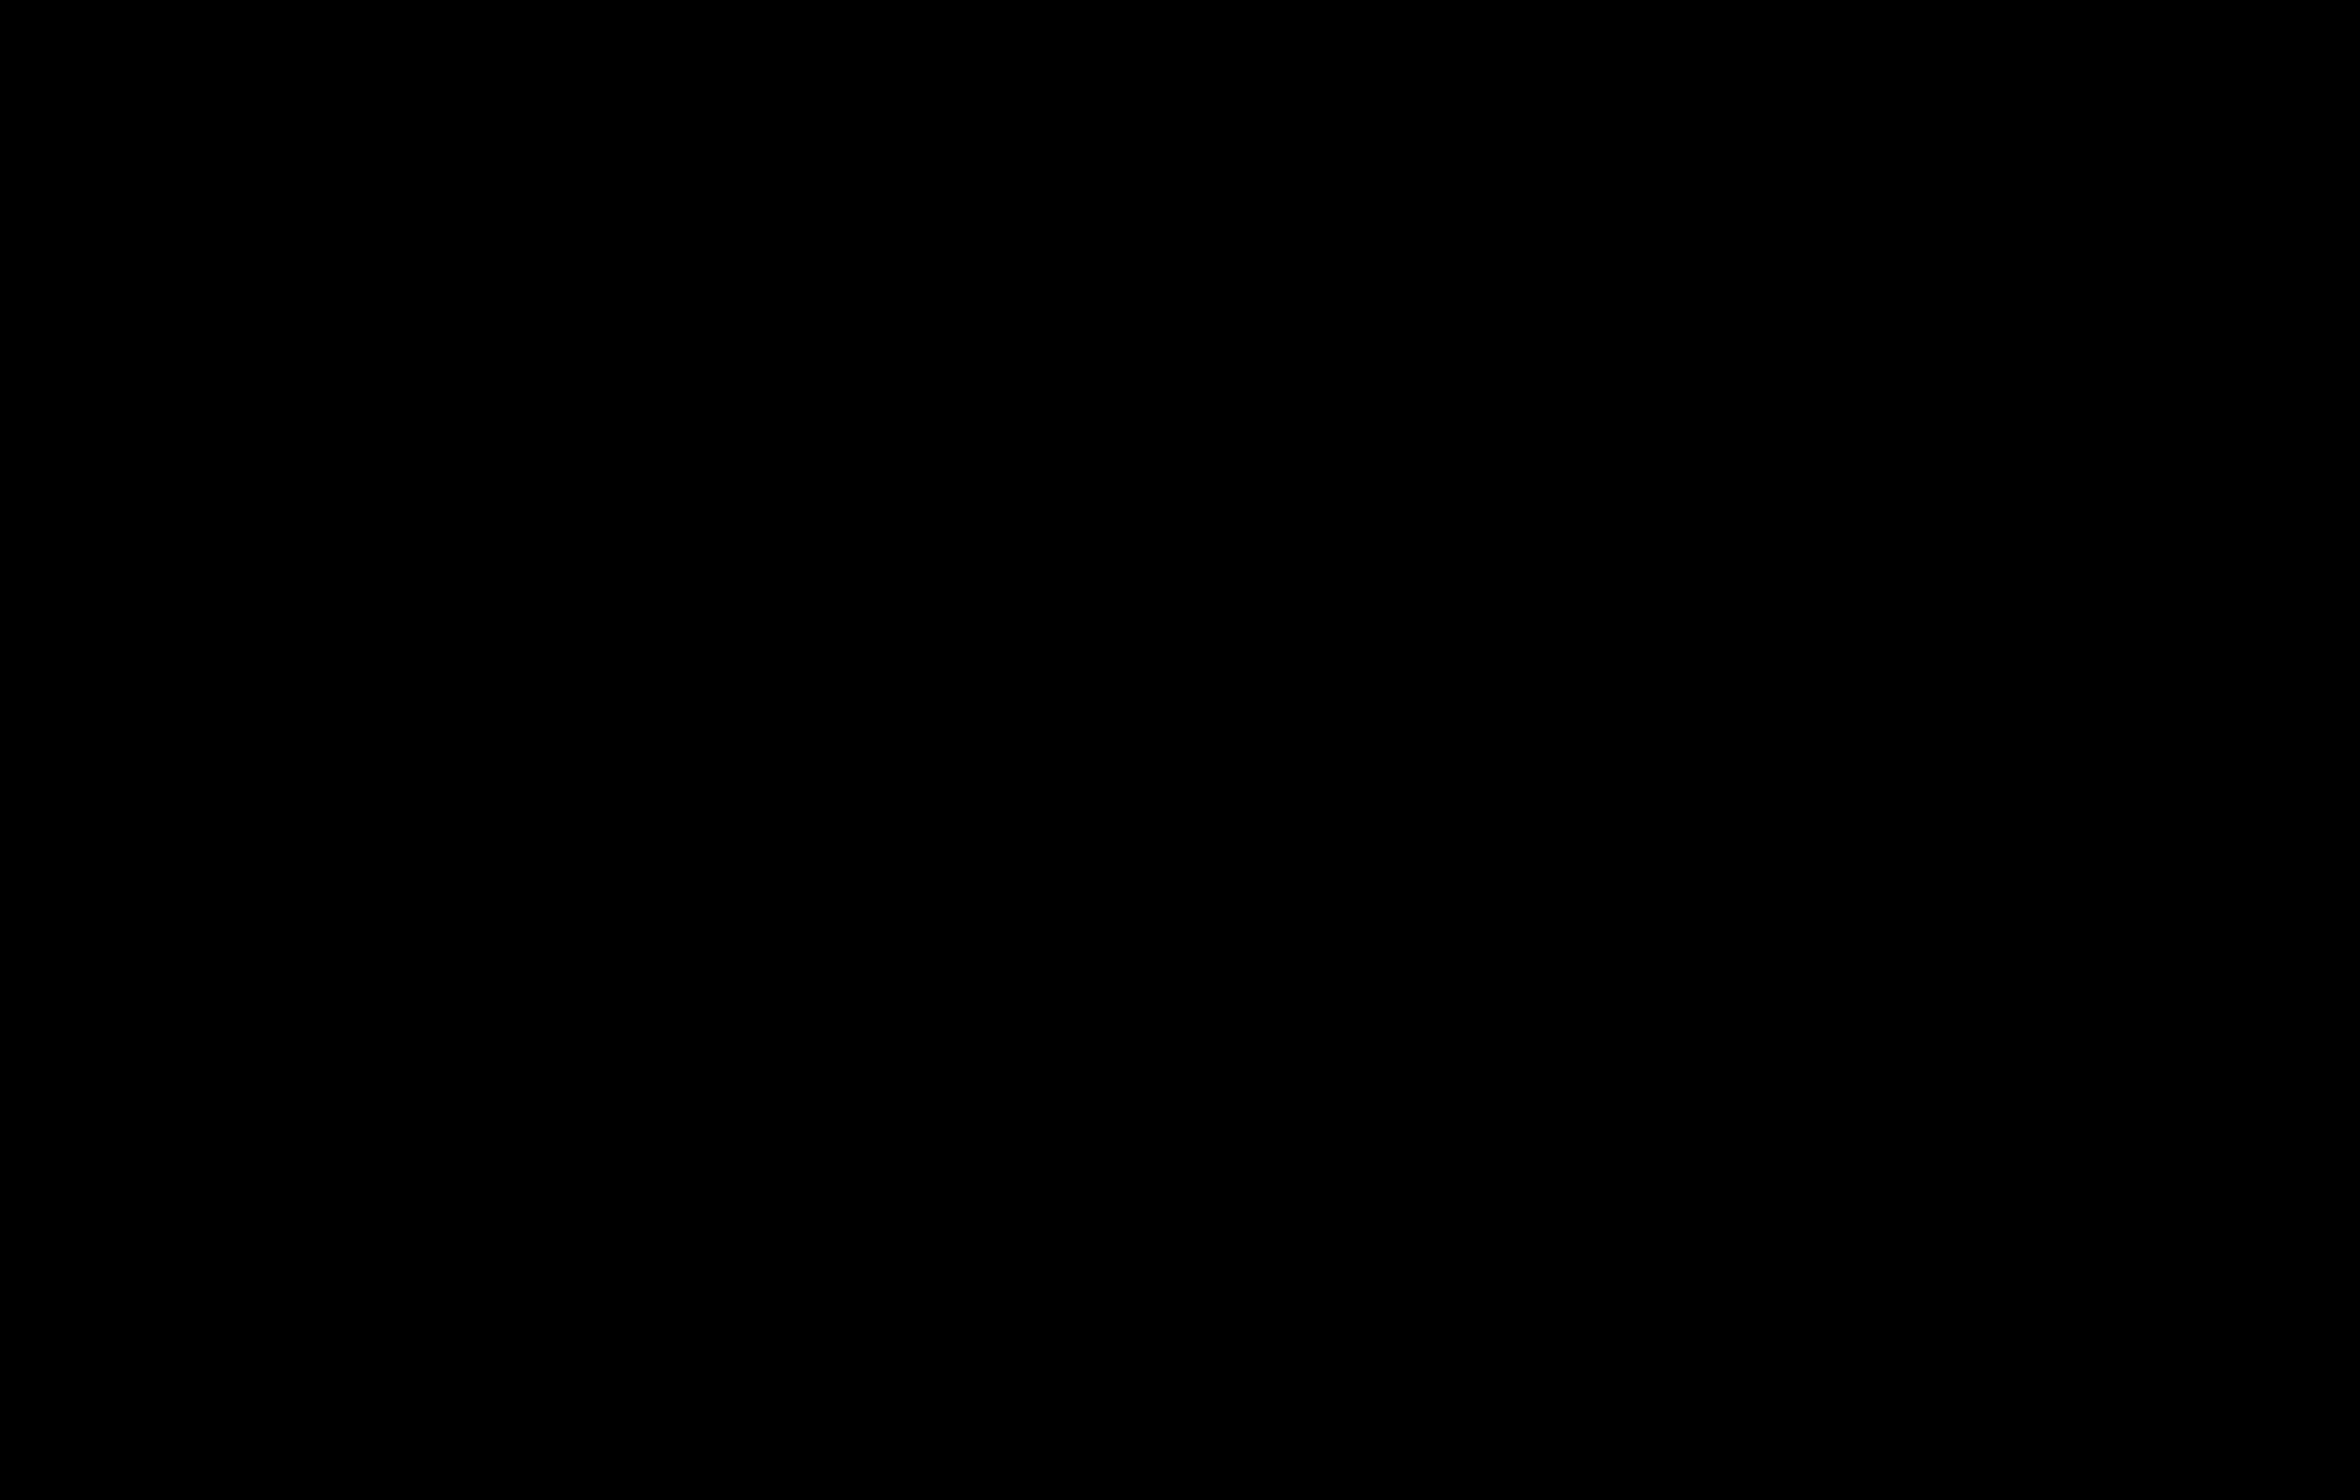 Clipart football dragon. Silhouette animal free black